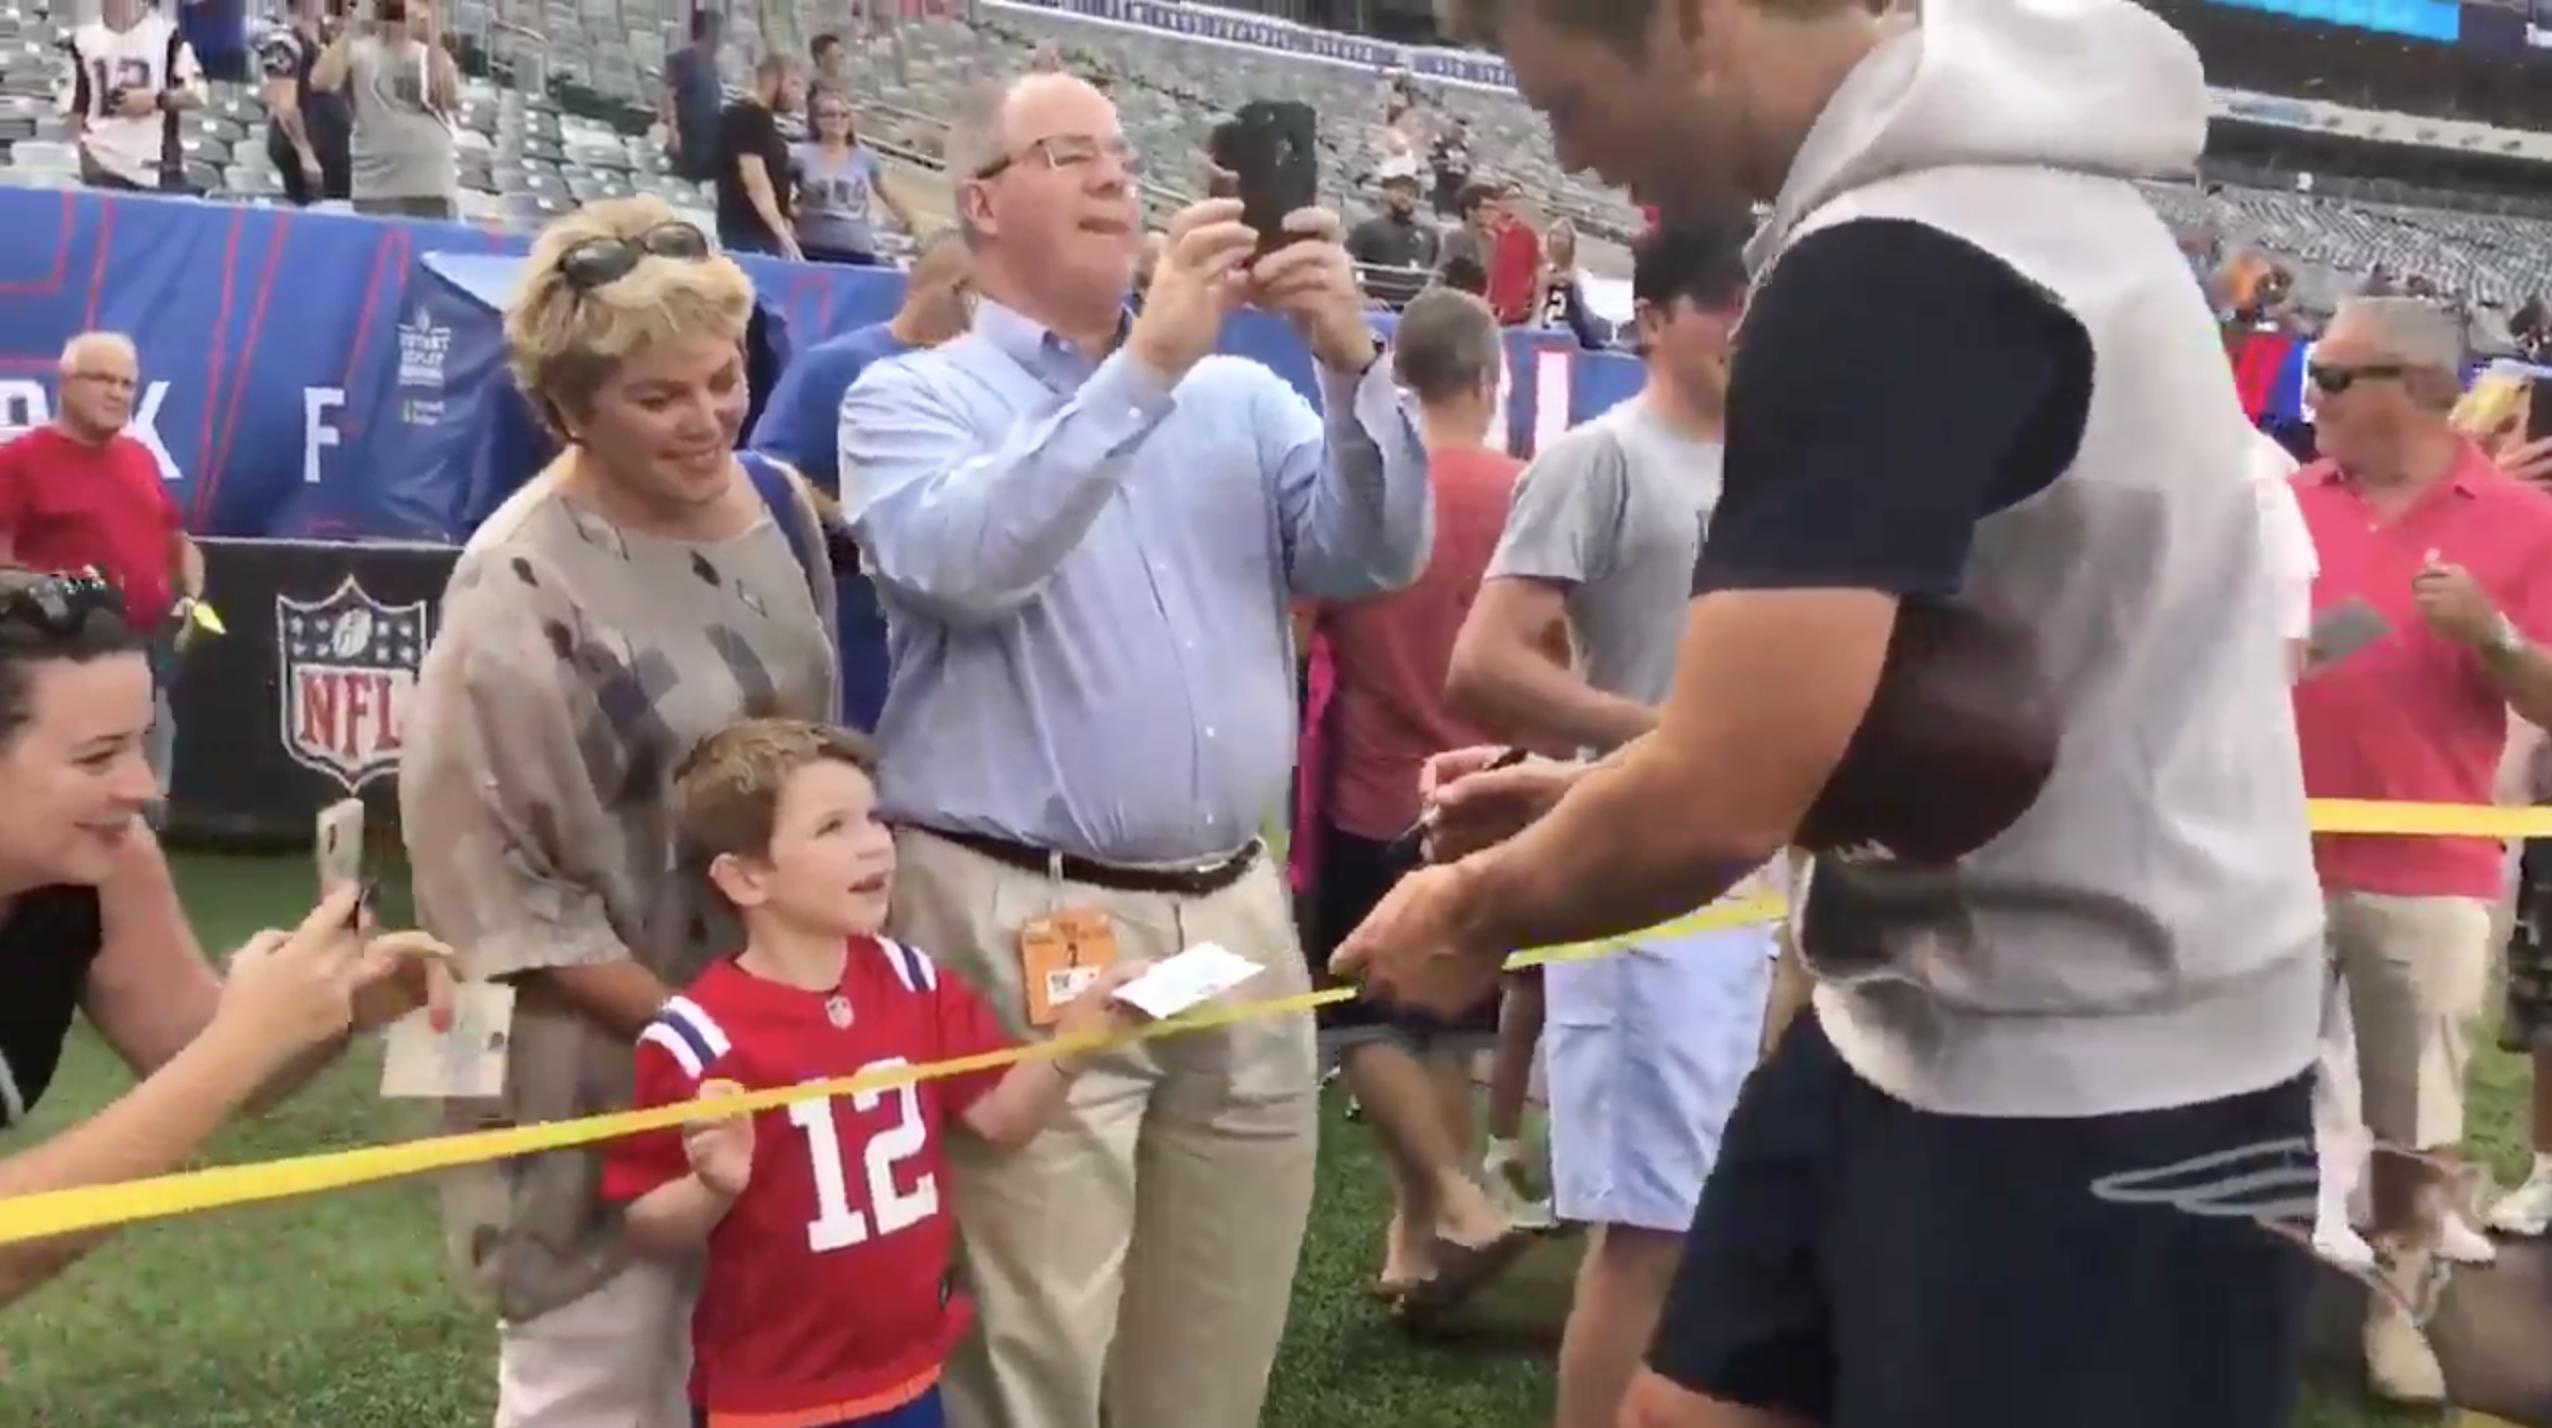 Tom Brady fan doesn't recognize Patriots QB (video)